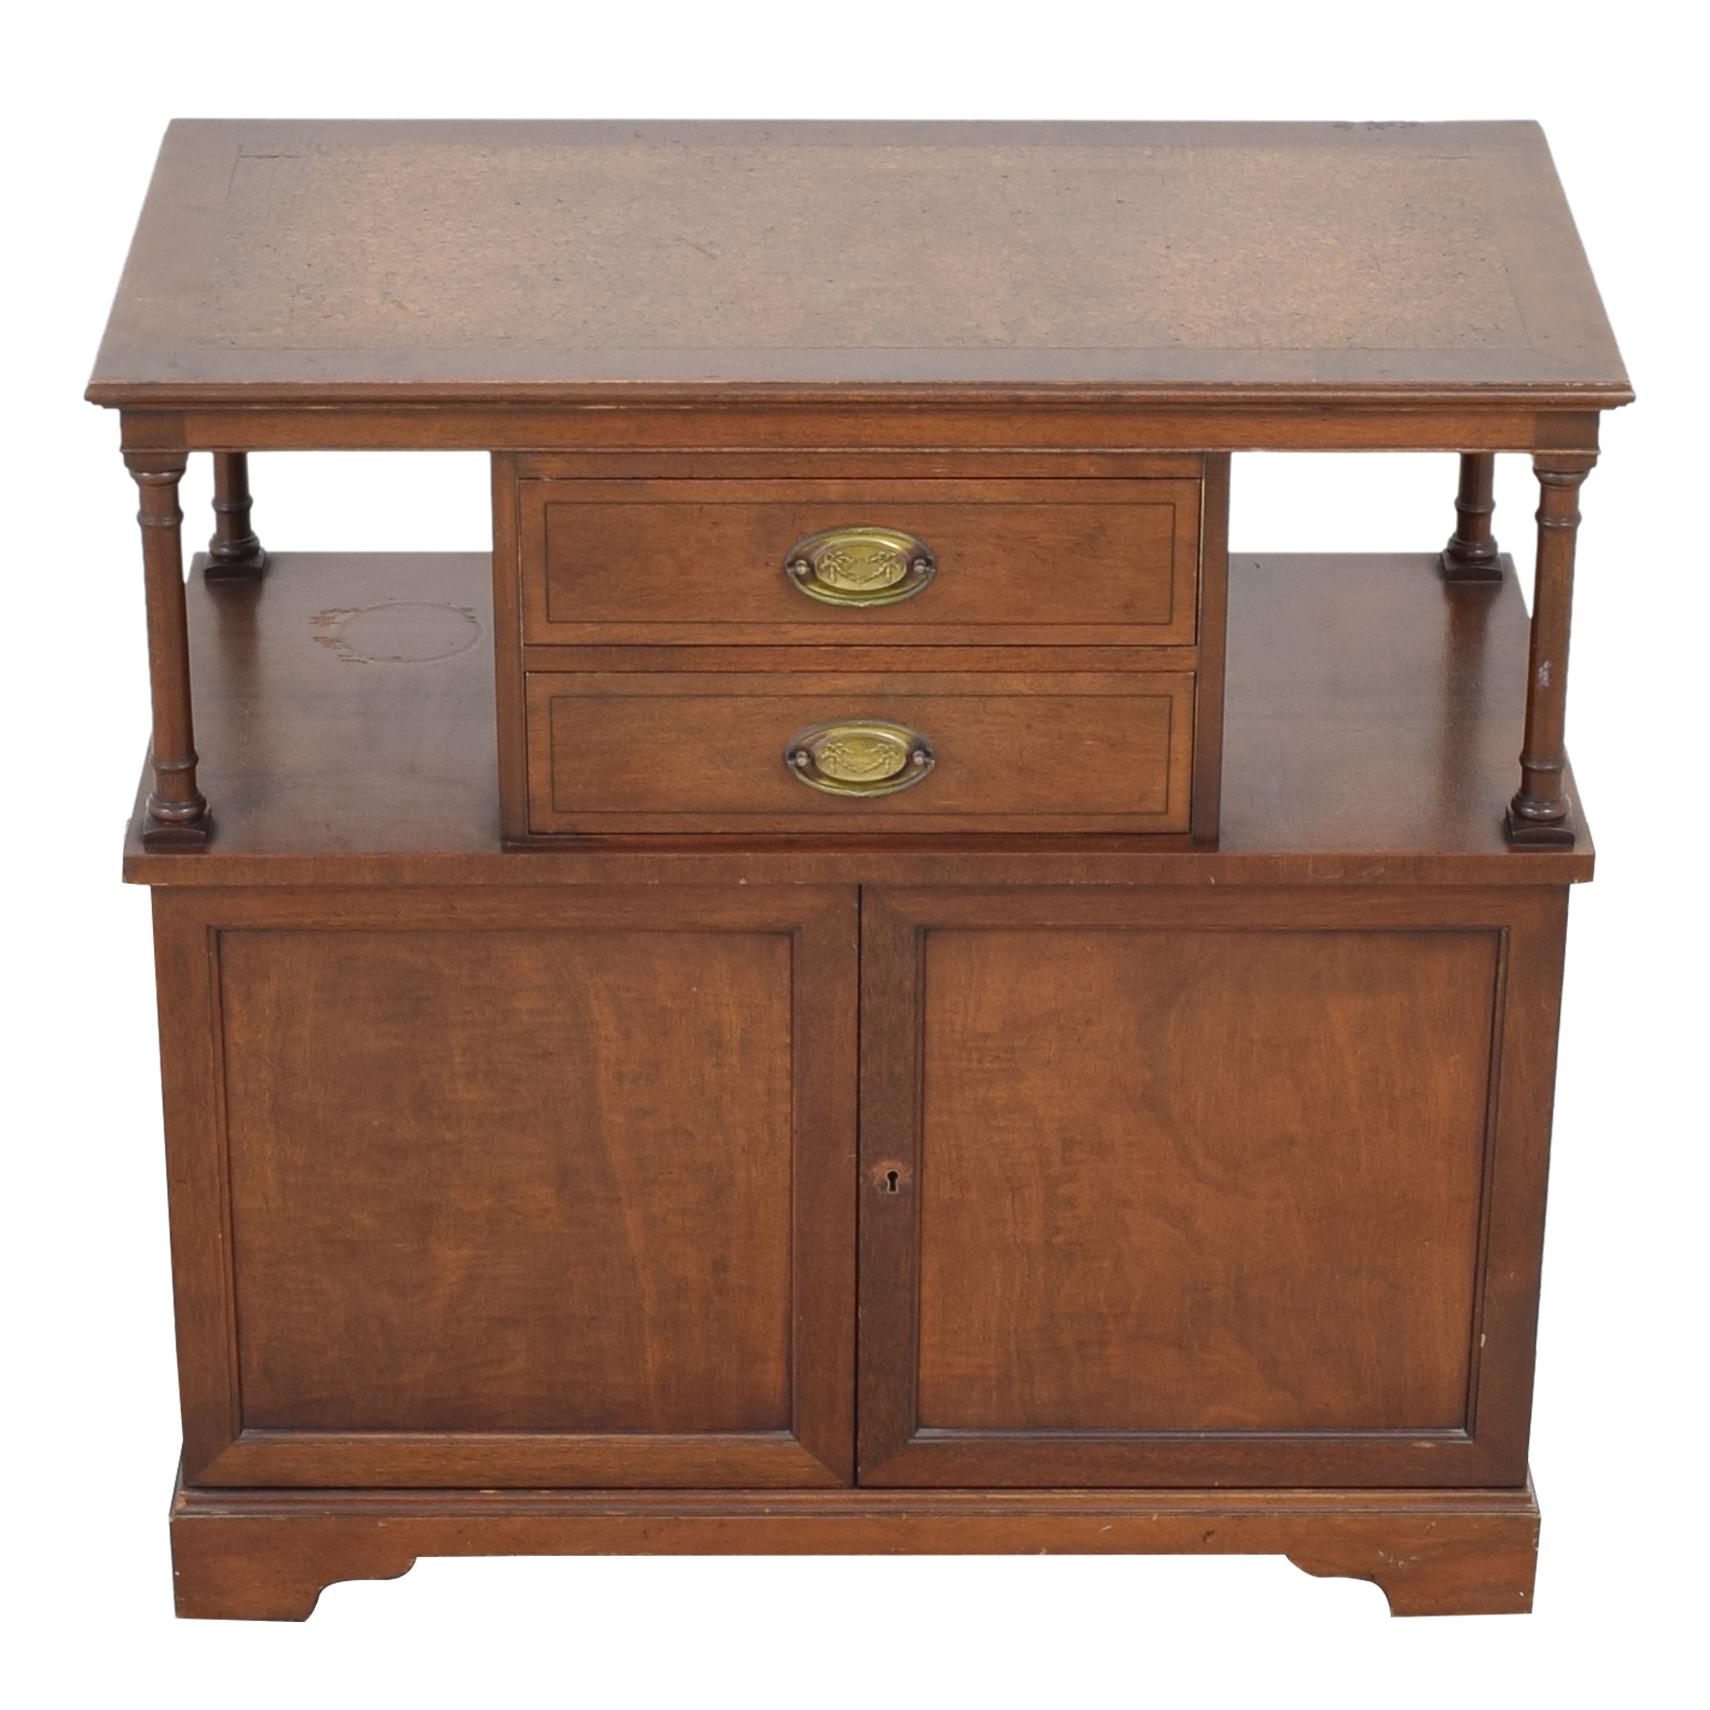 74 Off Henredon Furniture